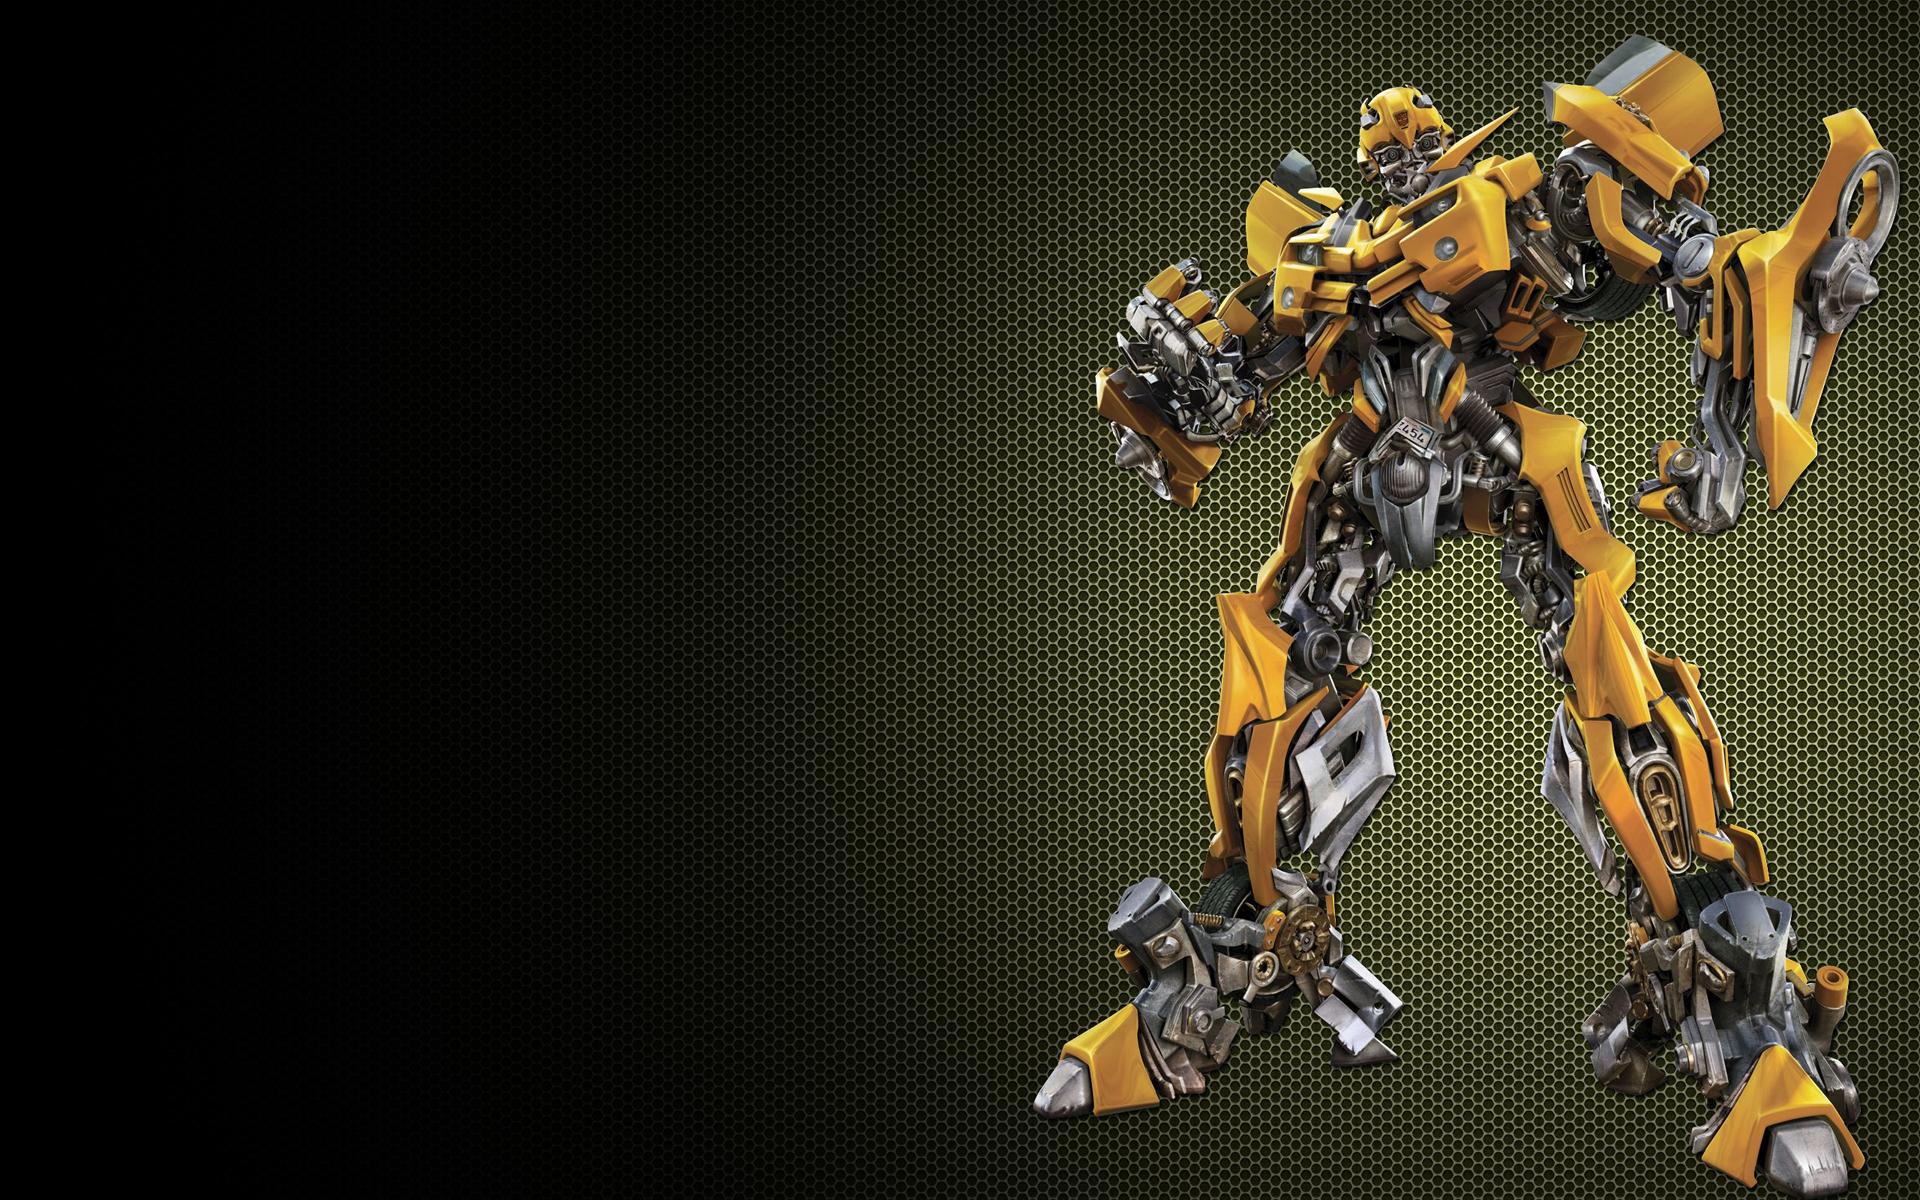 Bumblebee Transformer Wallpaper for Desktop 1920x1200